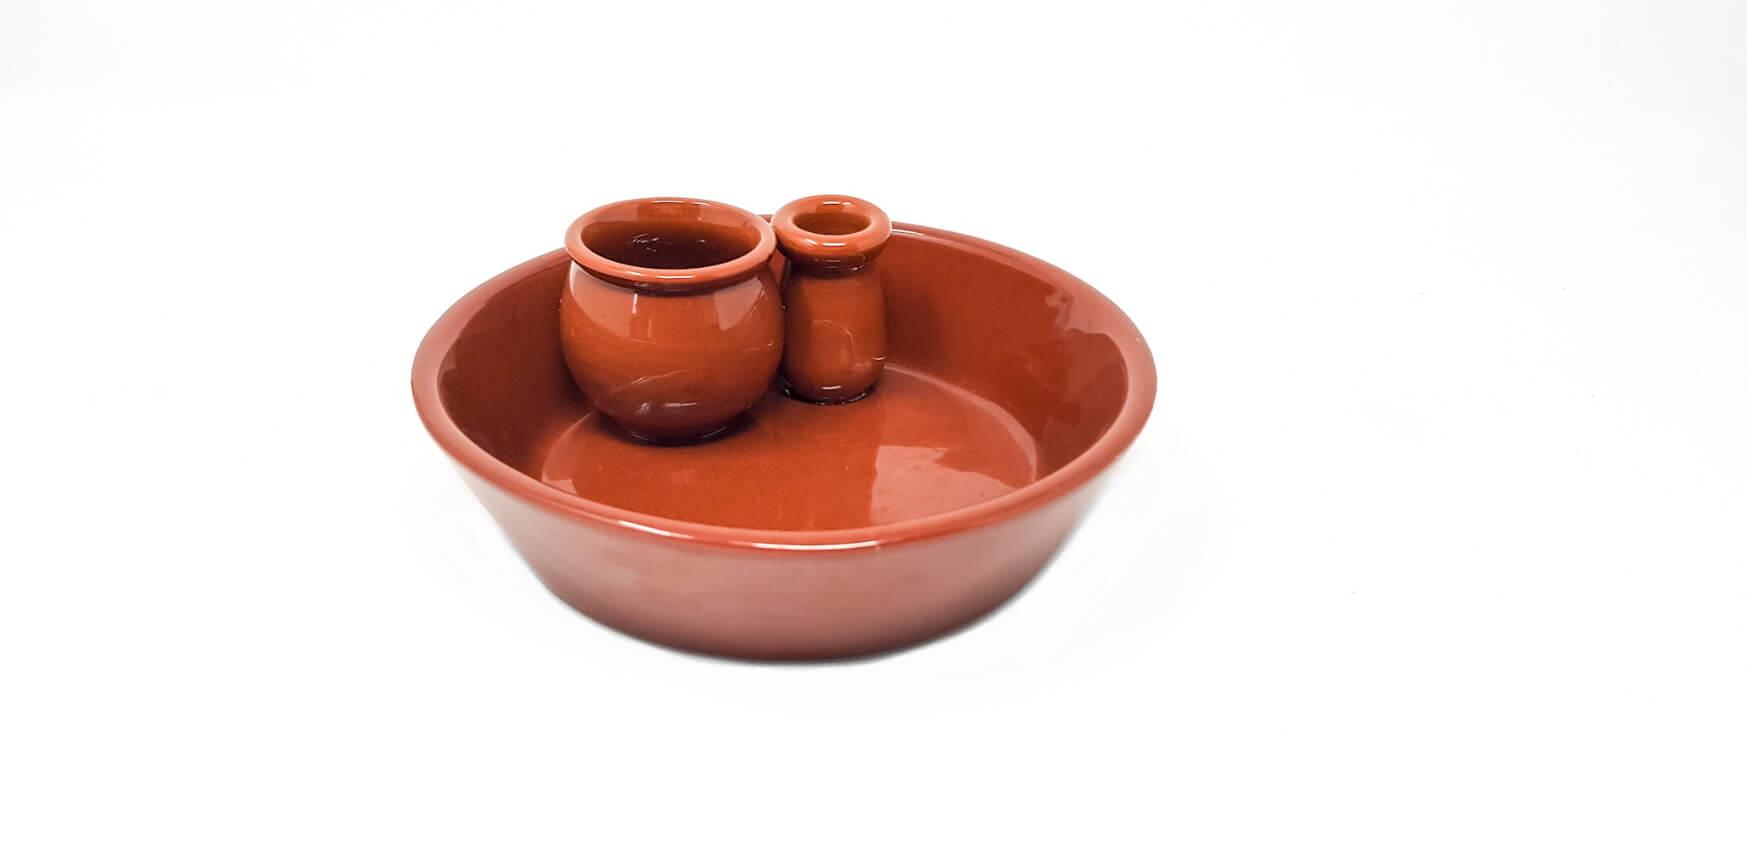 Verano-Spanish-Ceramics-El-Toro-Collection-Olive-Bowl-with-Olive-Picks-6